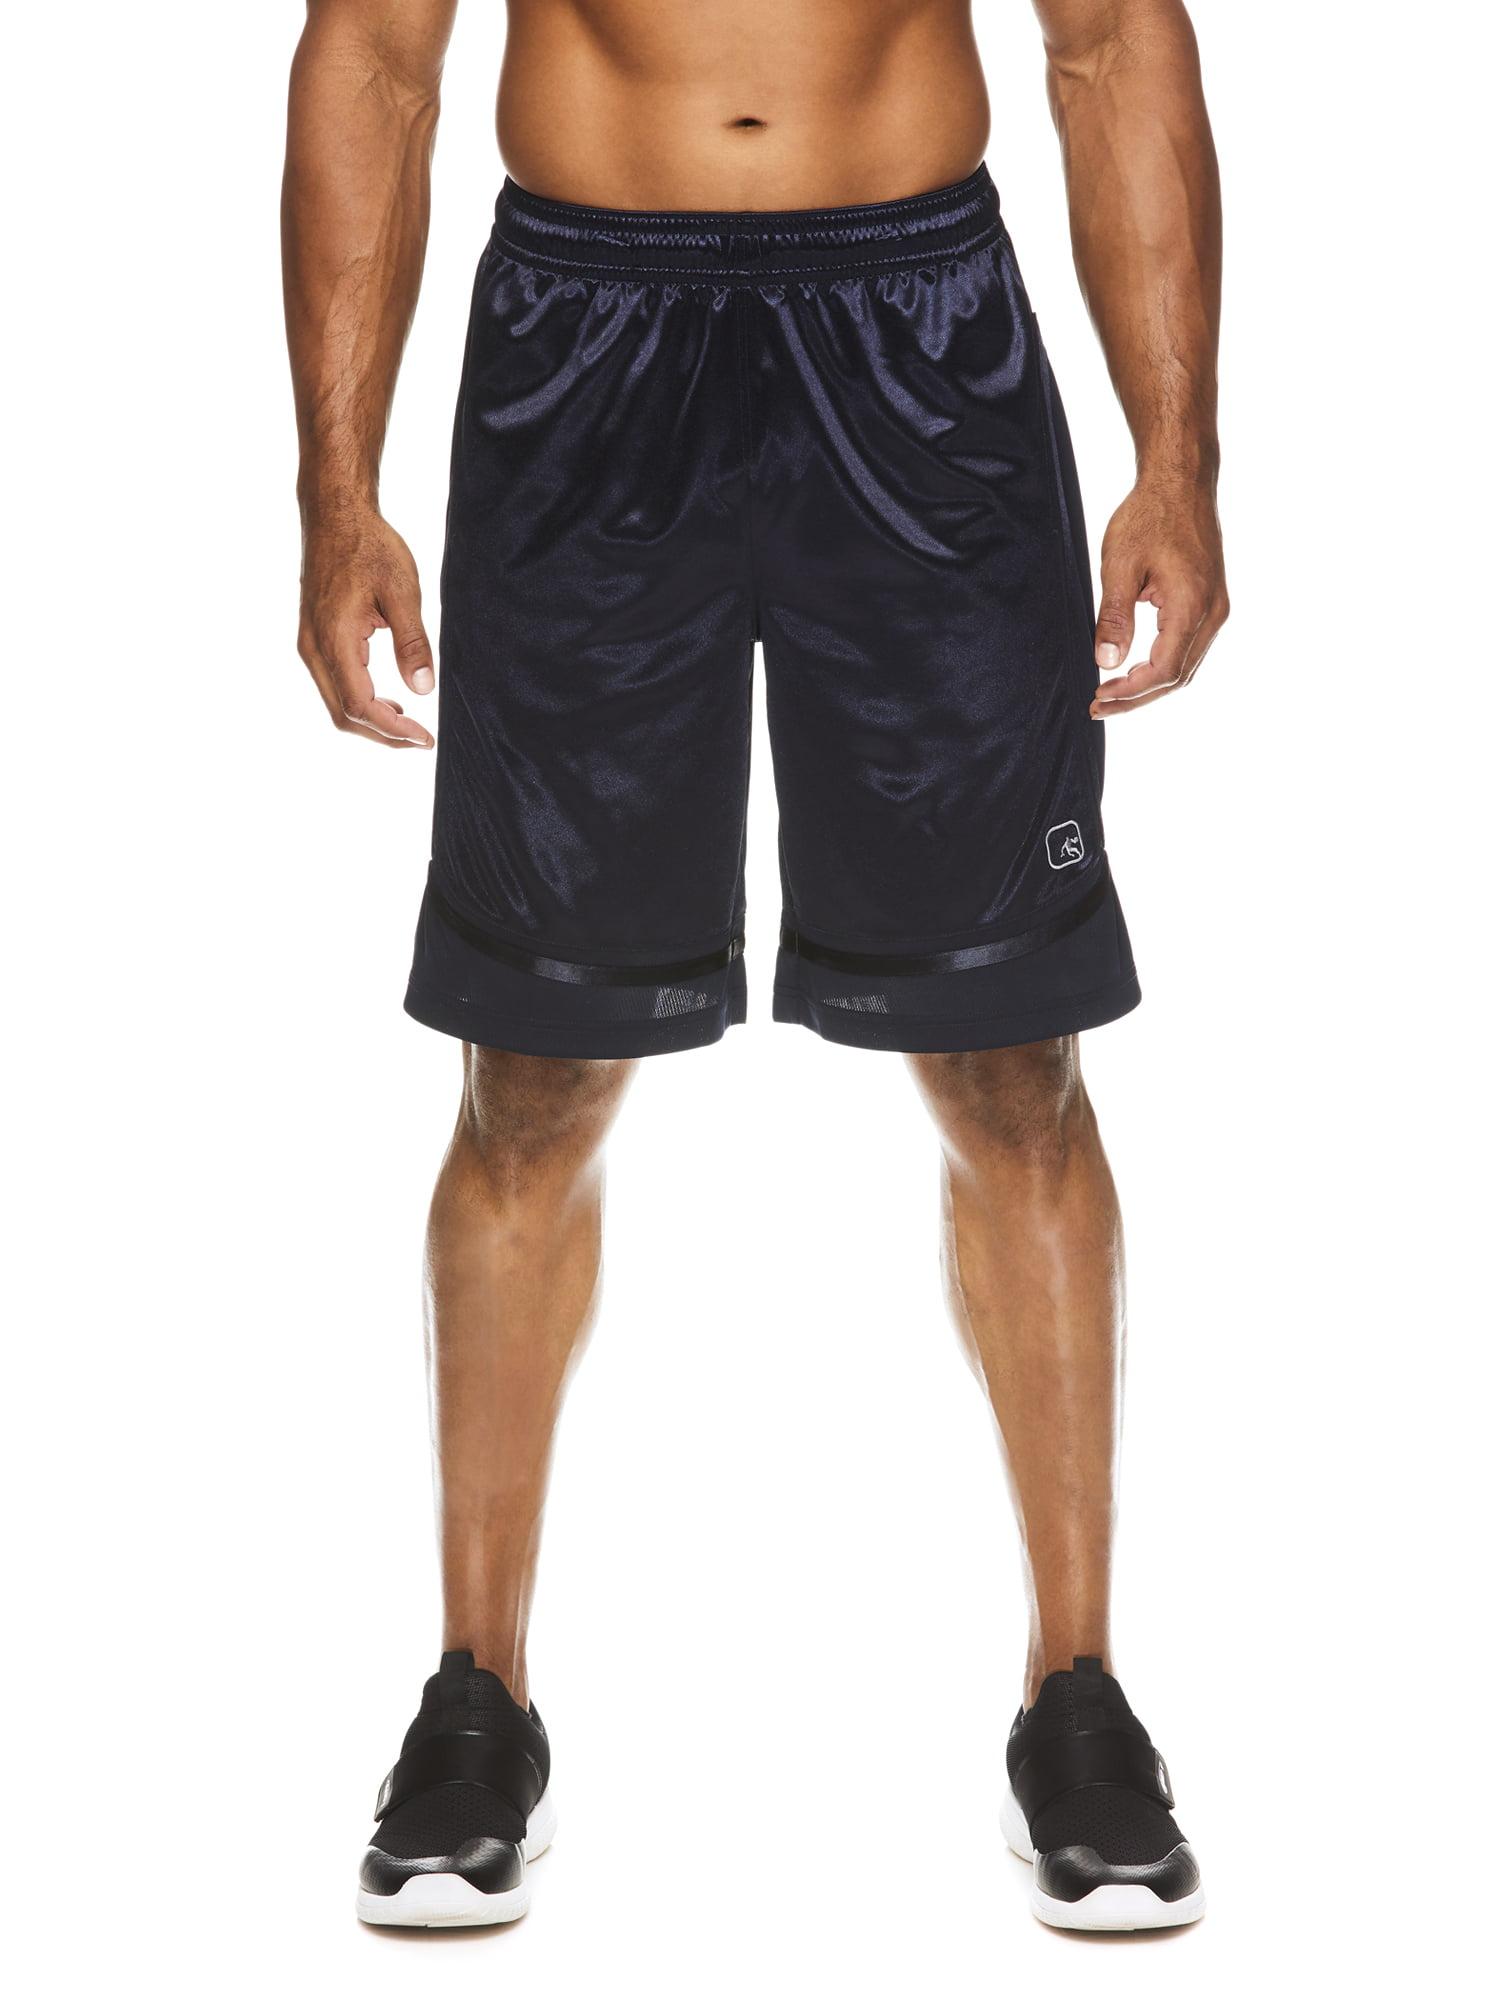 Big Men's Basketball Short